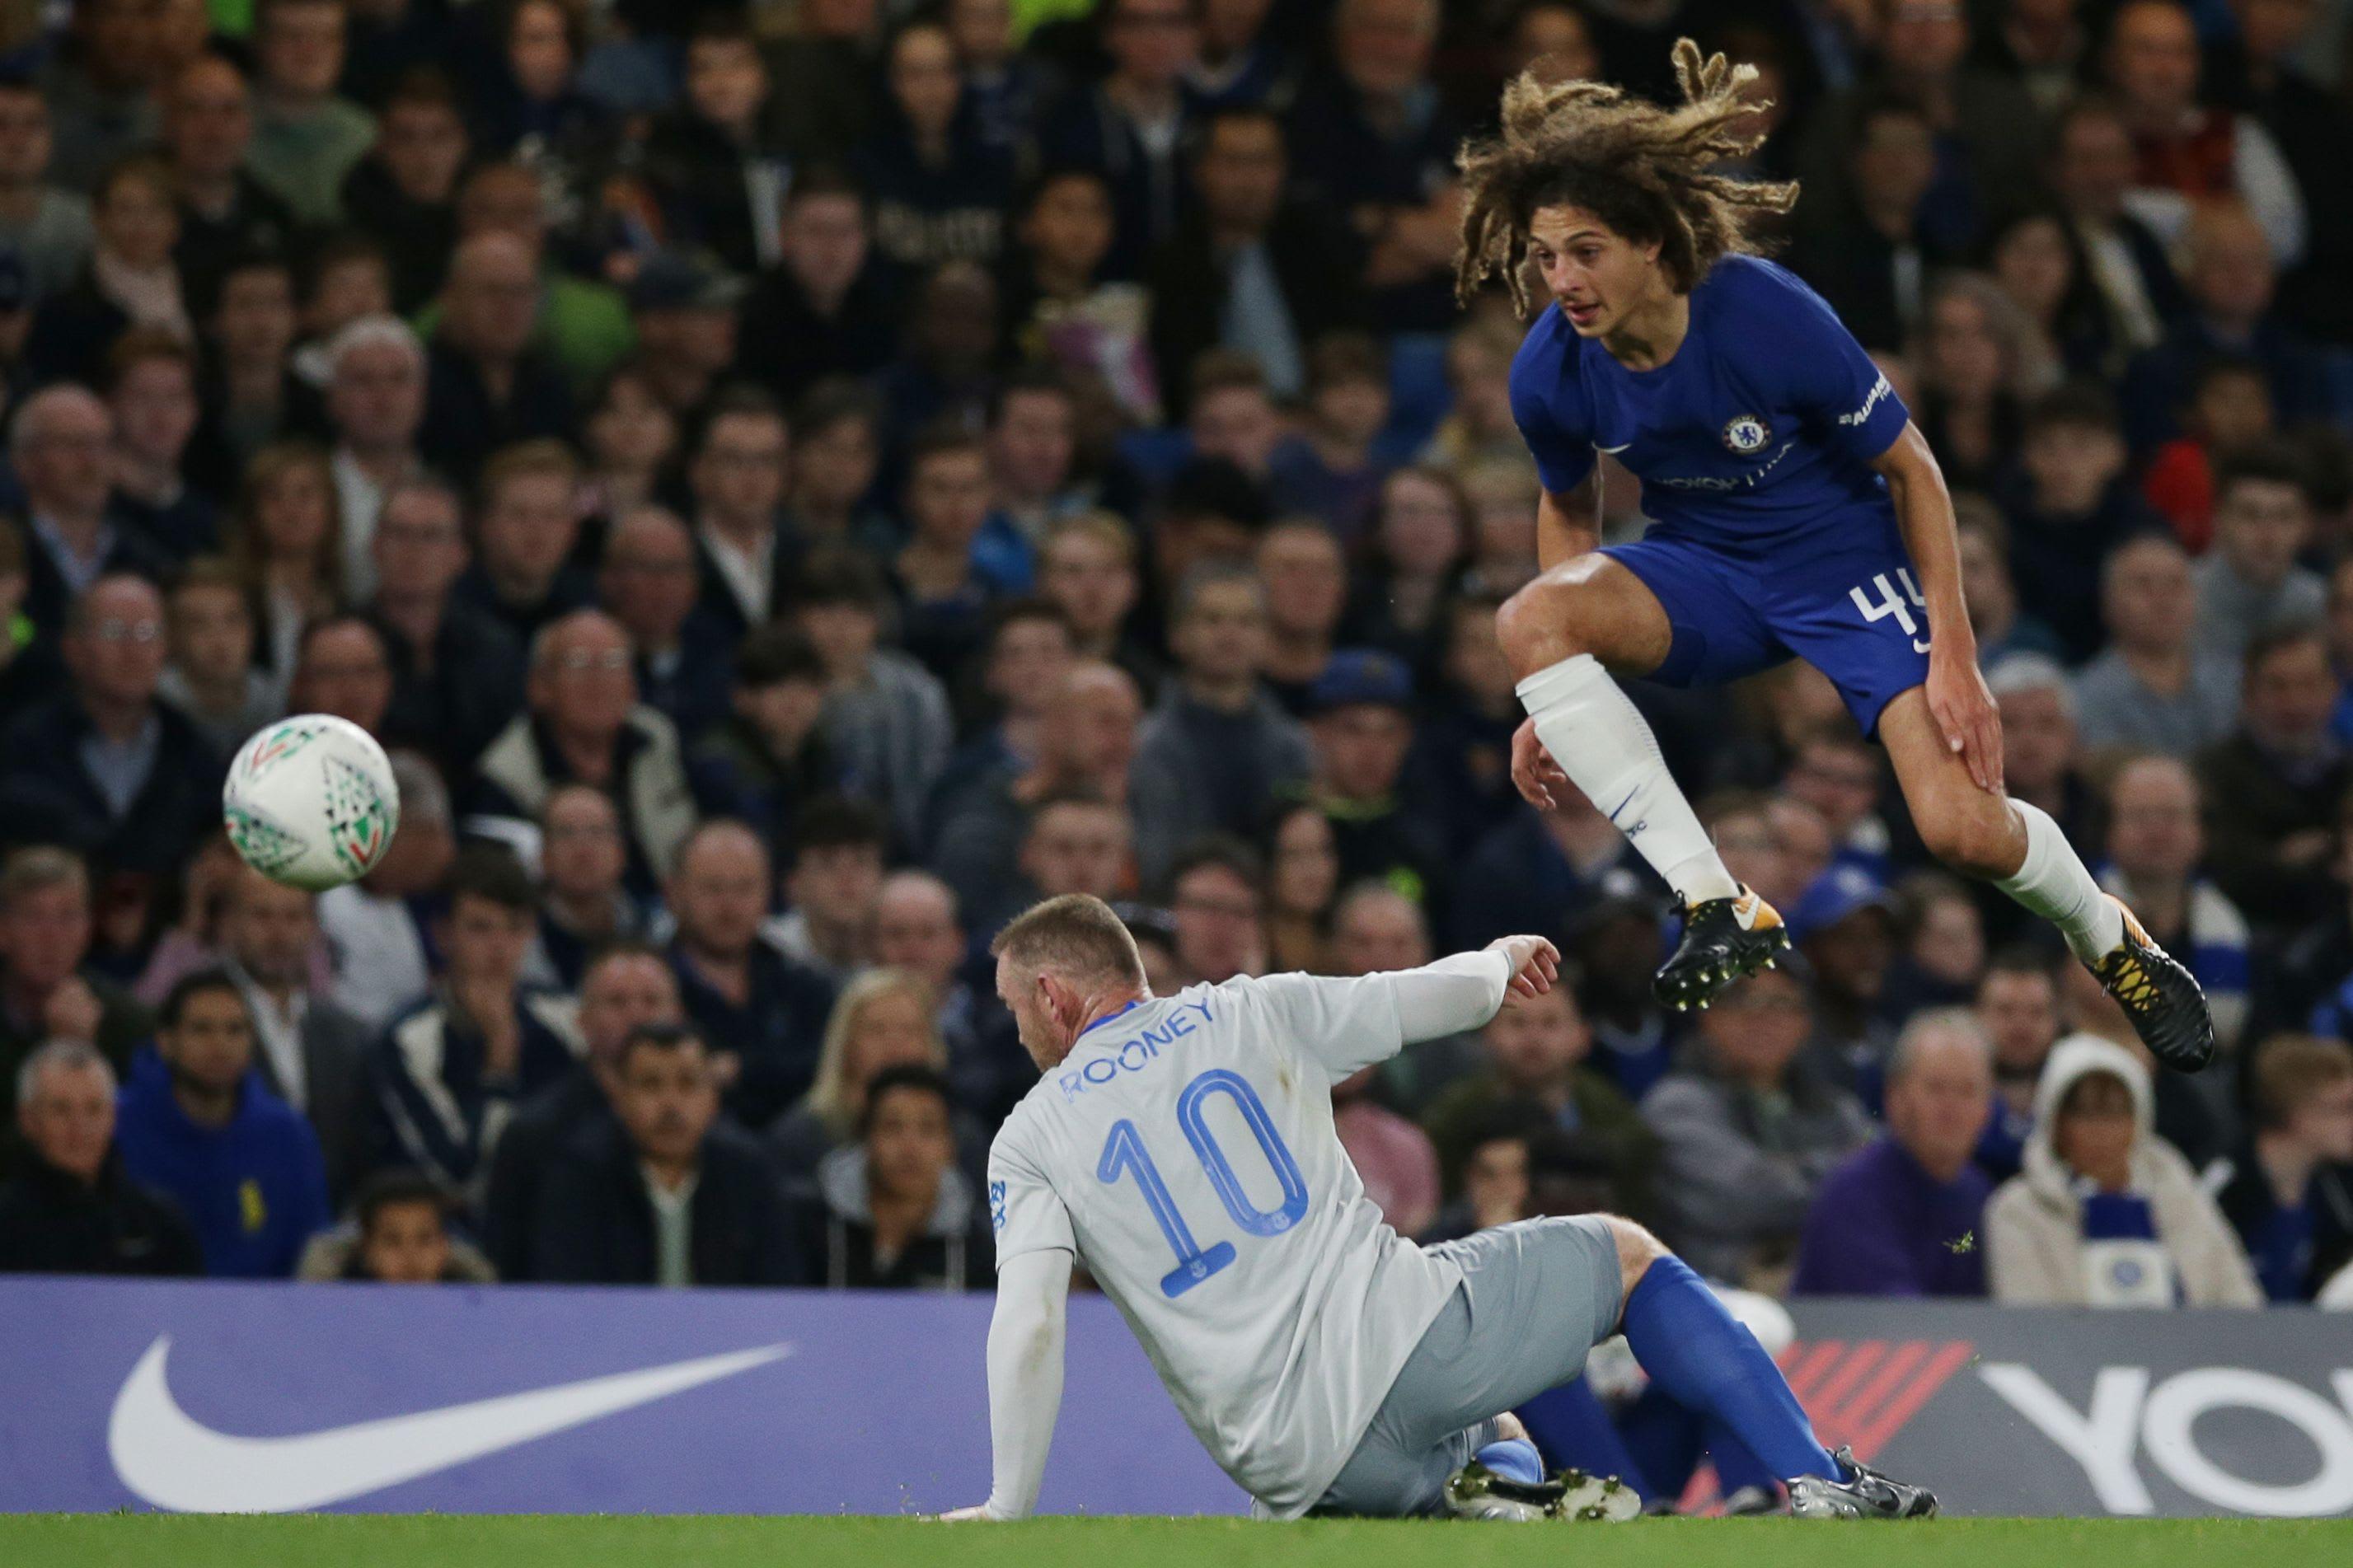 Ethan Ampadu gets the ball over Everton's Wayne Rooney